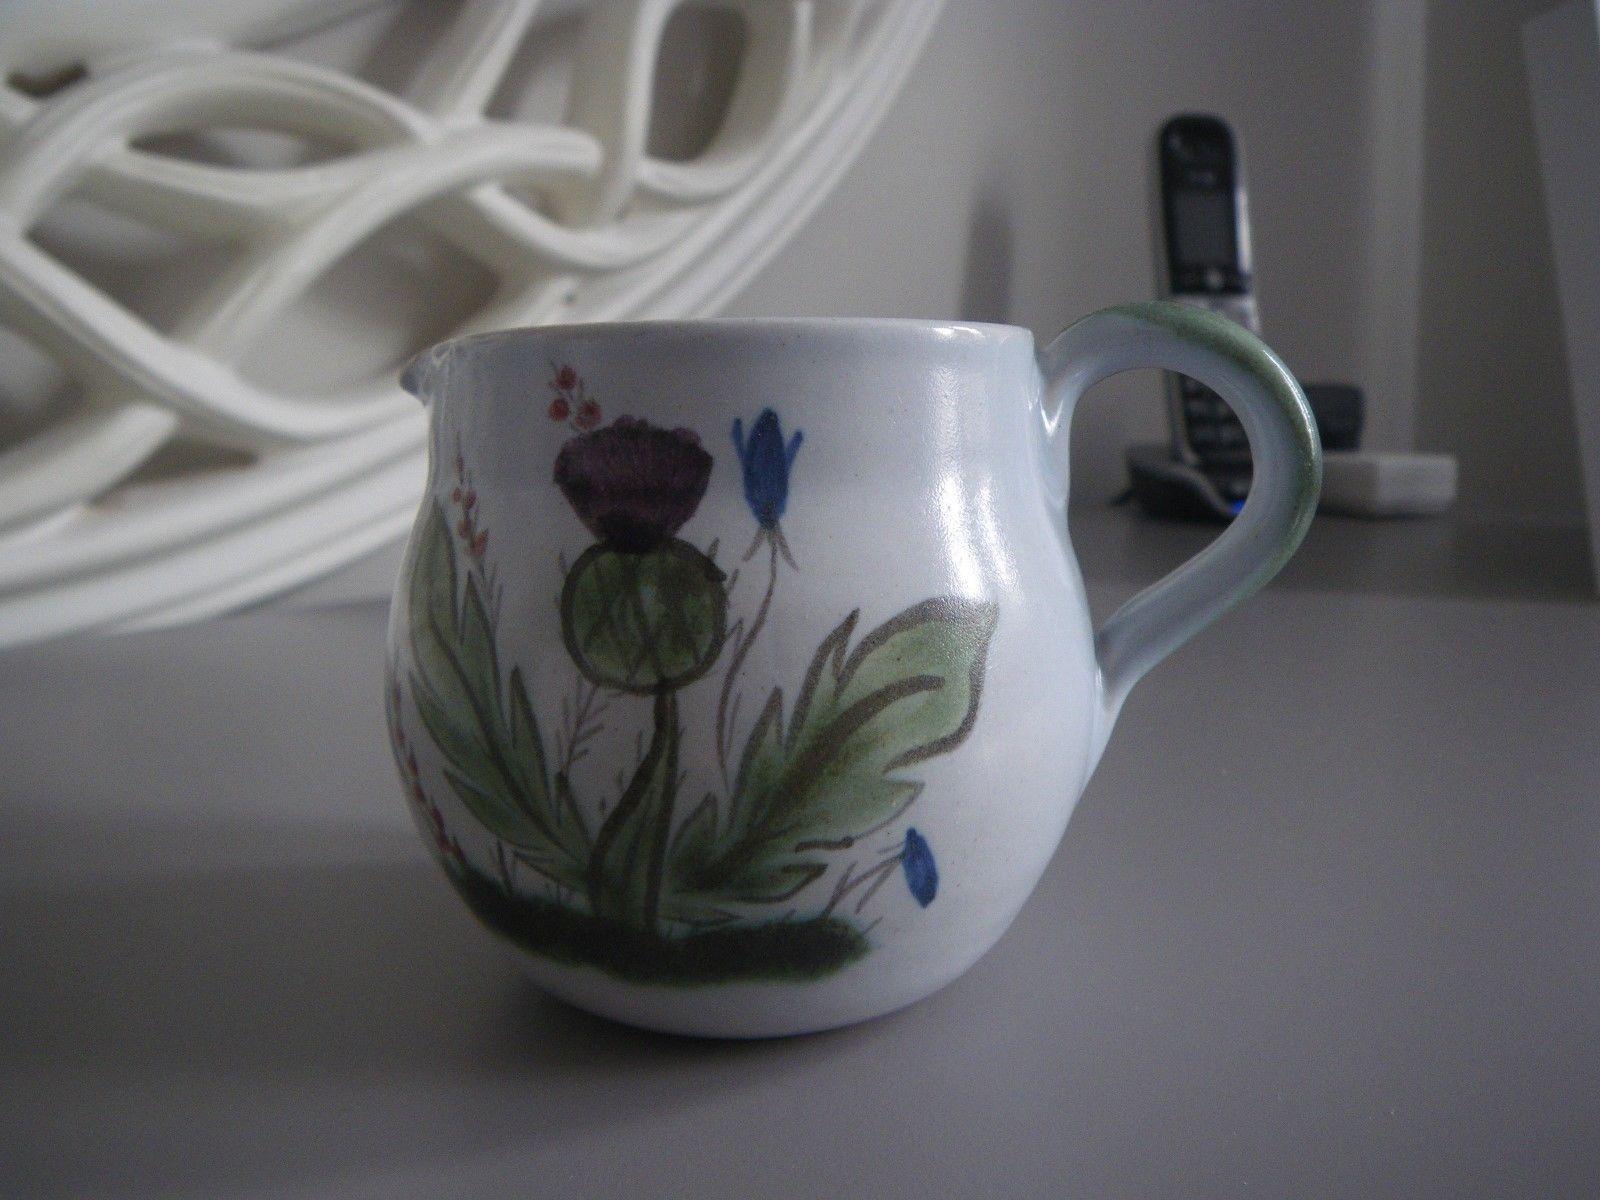 Buchan Pottery Portobello Stoneware Mug Thistle pattern